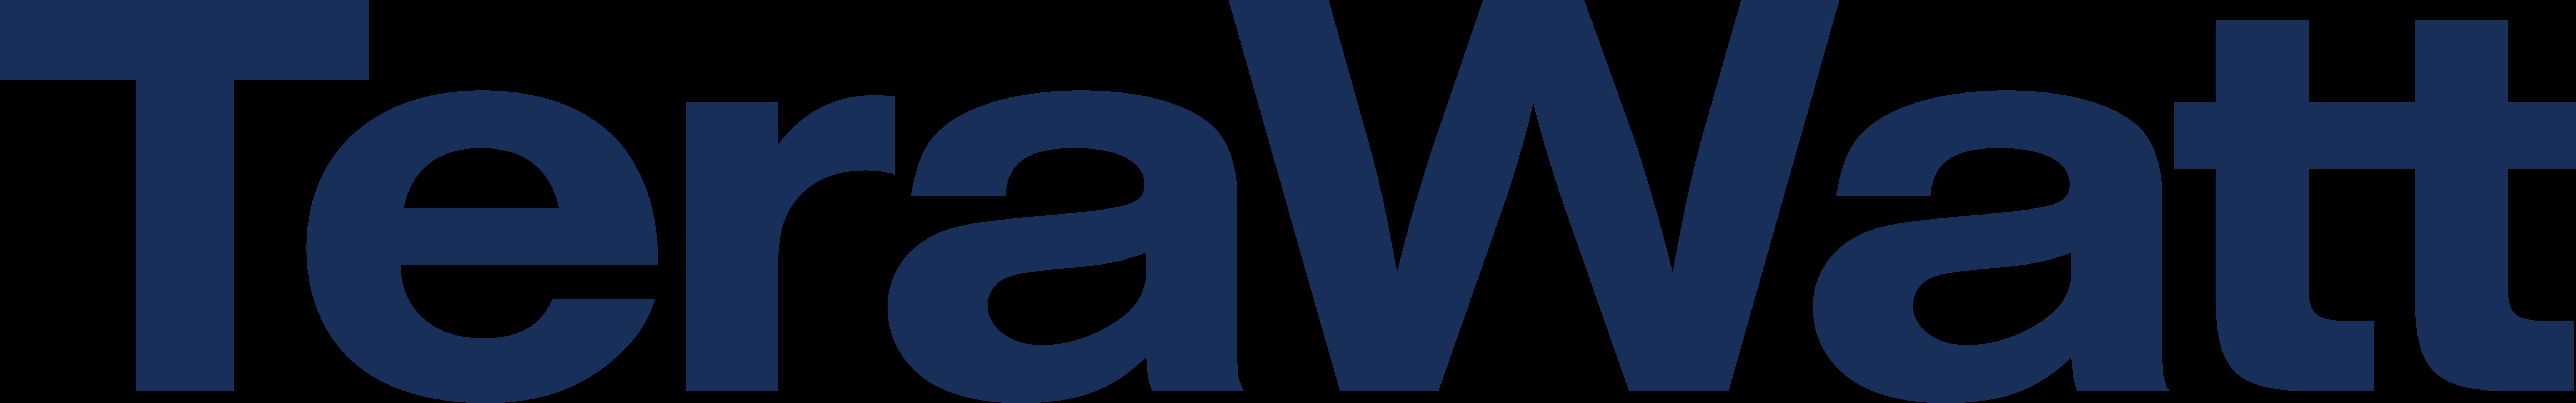 TeraWatt Infrastructure logo